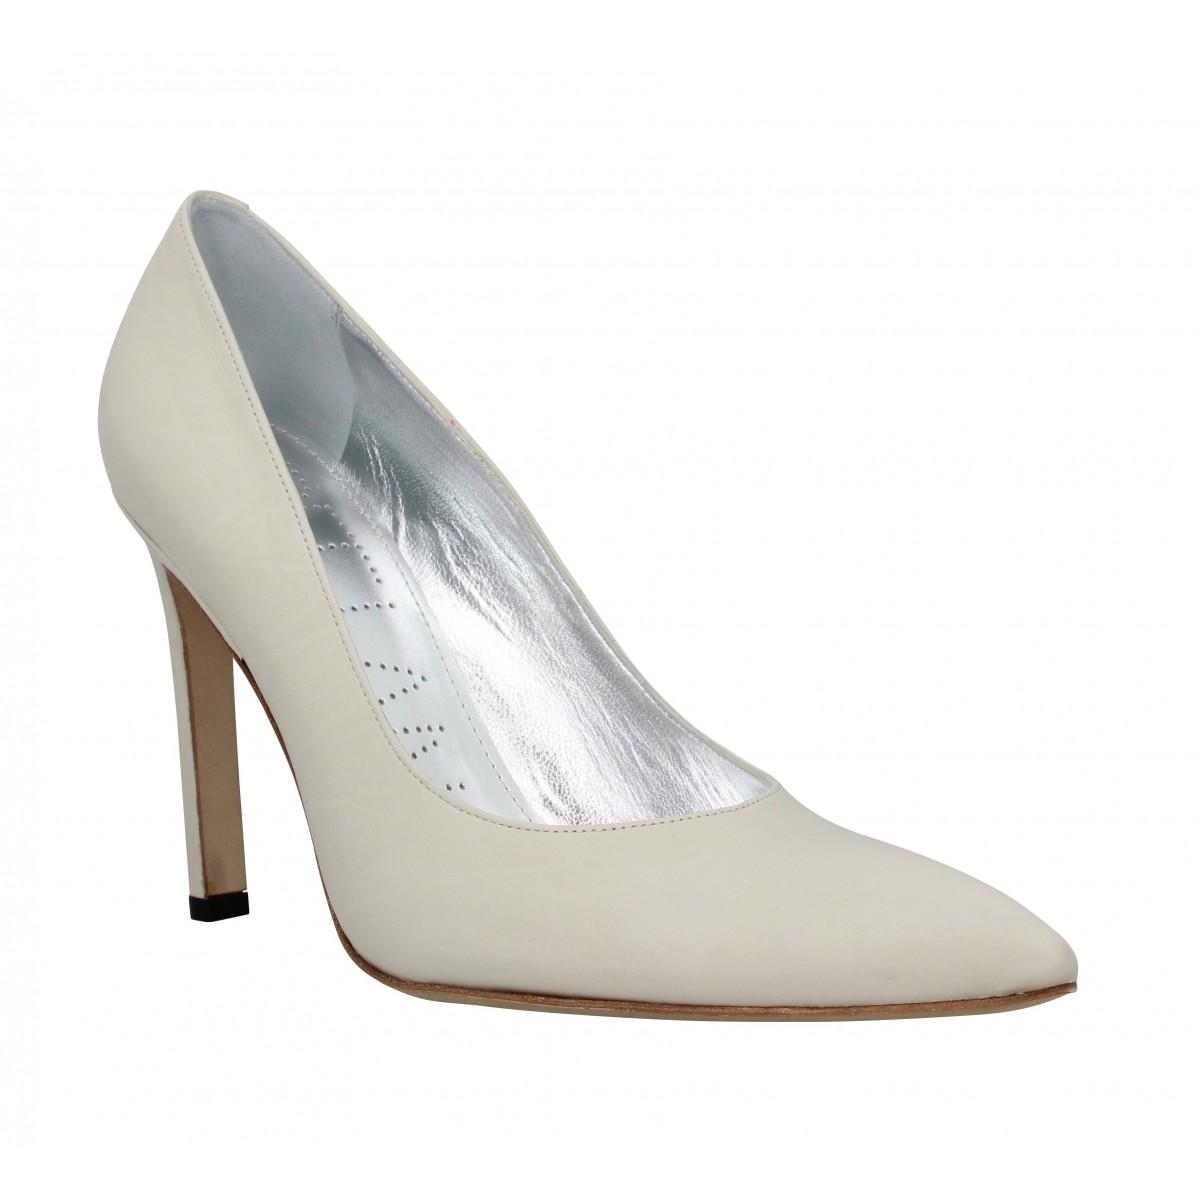 Lance 9 Chaussures Cuir Free Pumps CremeFanny Forel Femme HW9DYE2I